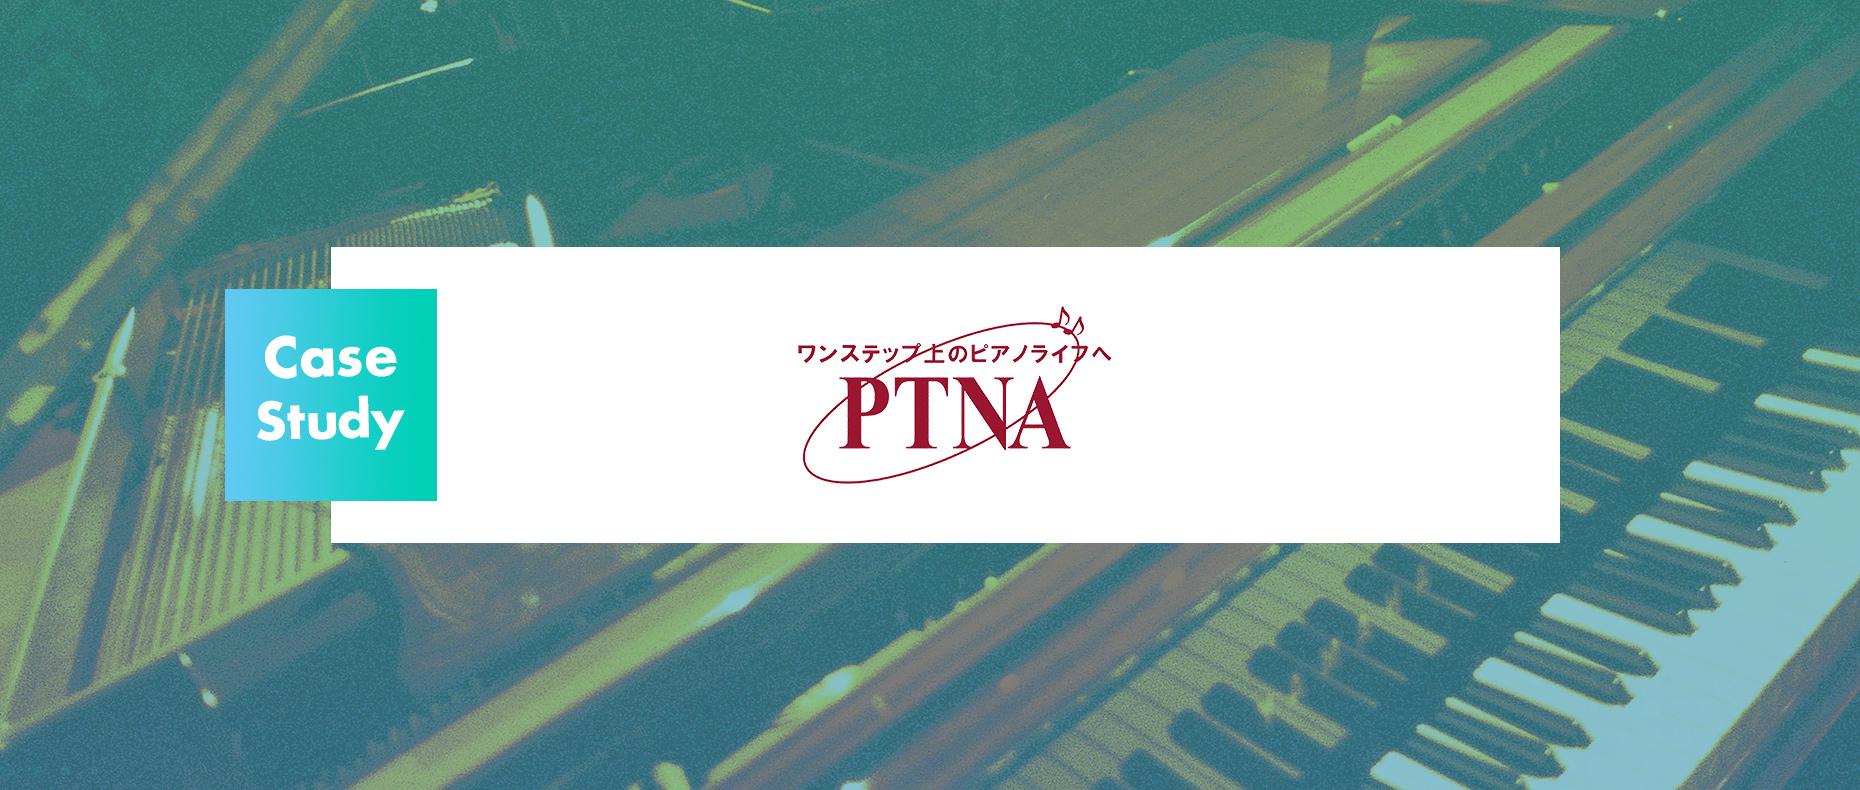 一般社団法人全日本ピアノ指導者協会様